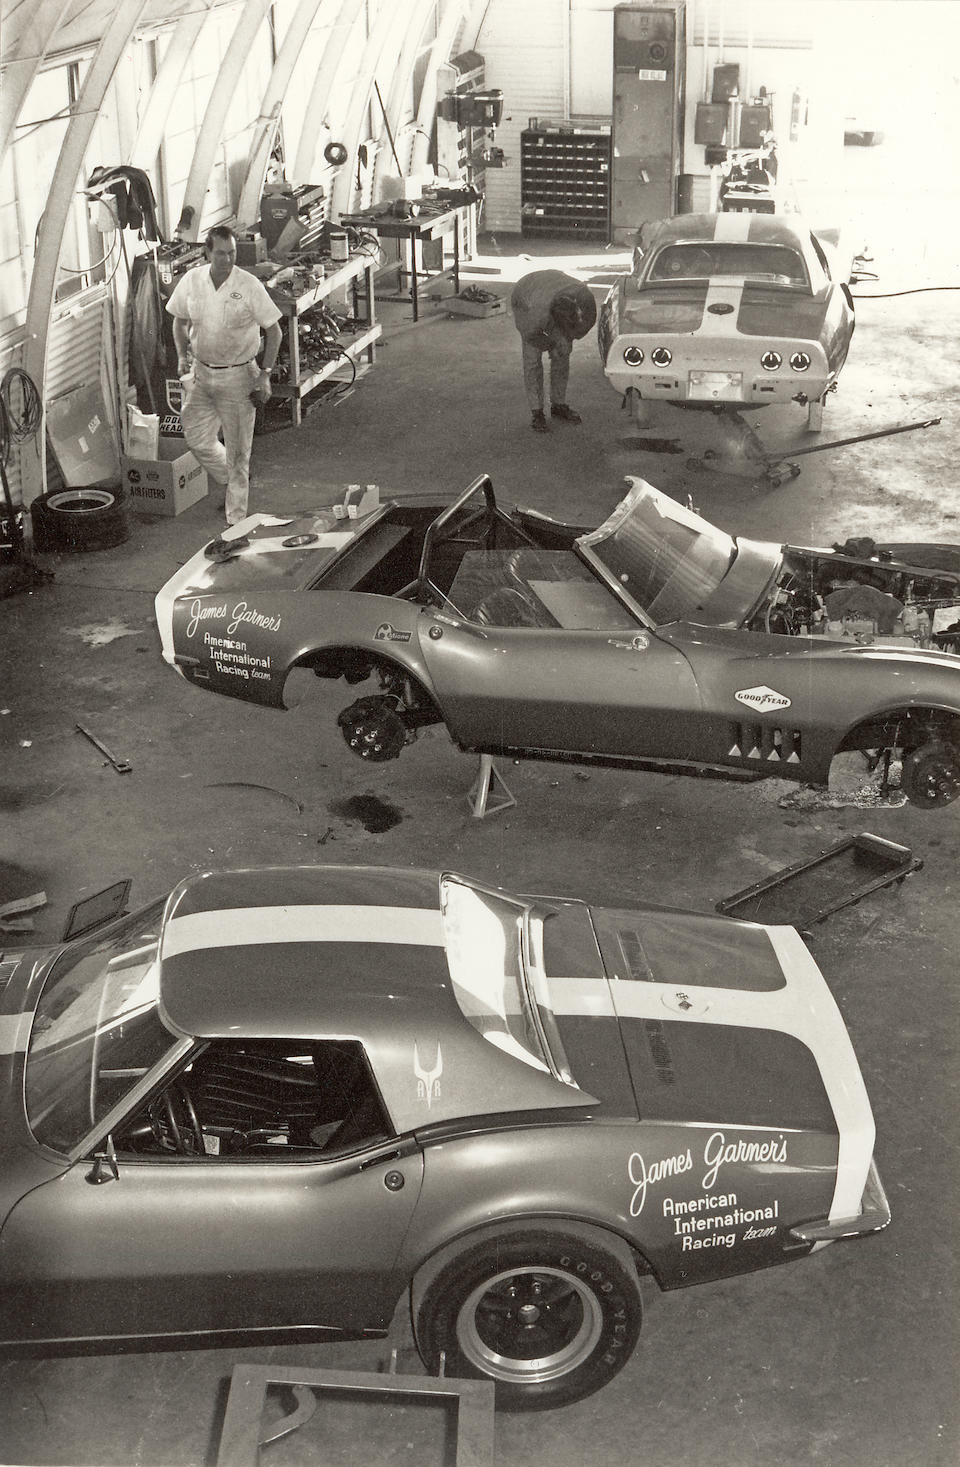 Bonhams : The ex-James Garner/American International Racing